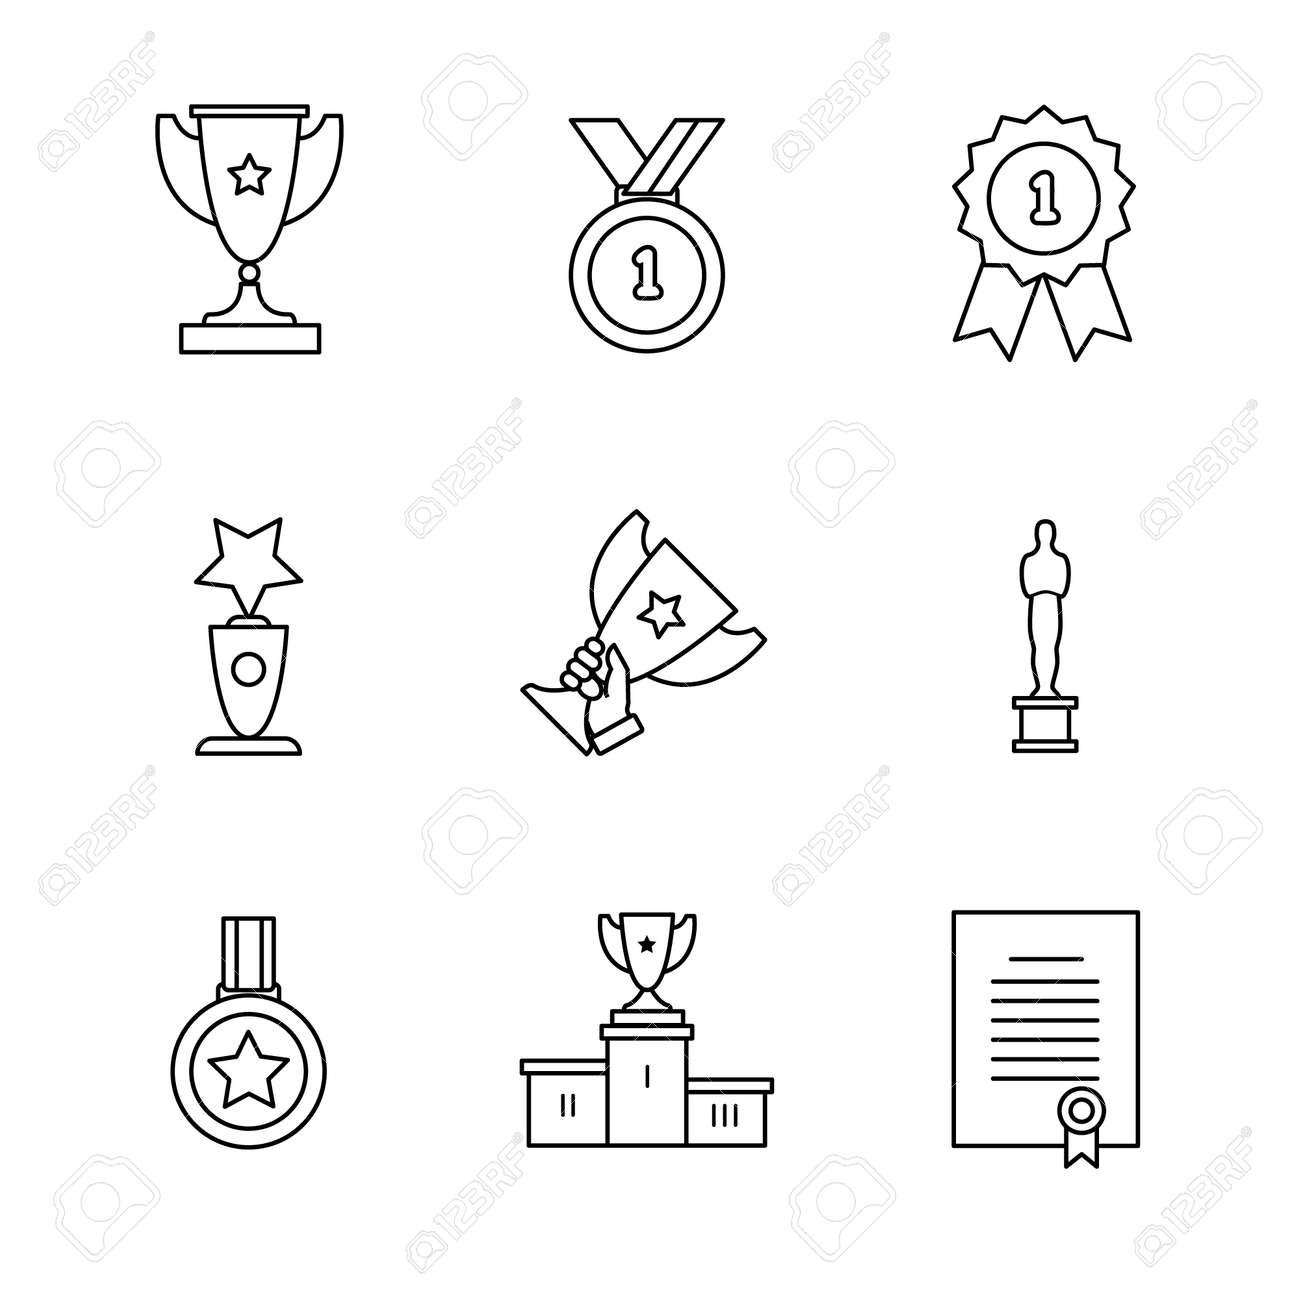 Award winner icons thin line art set. Black vector symbols isolated on white. - 52949117